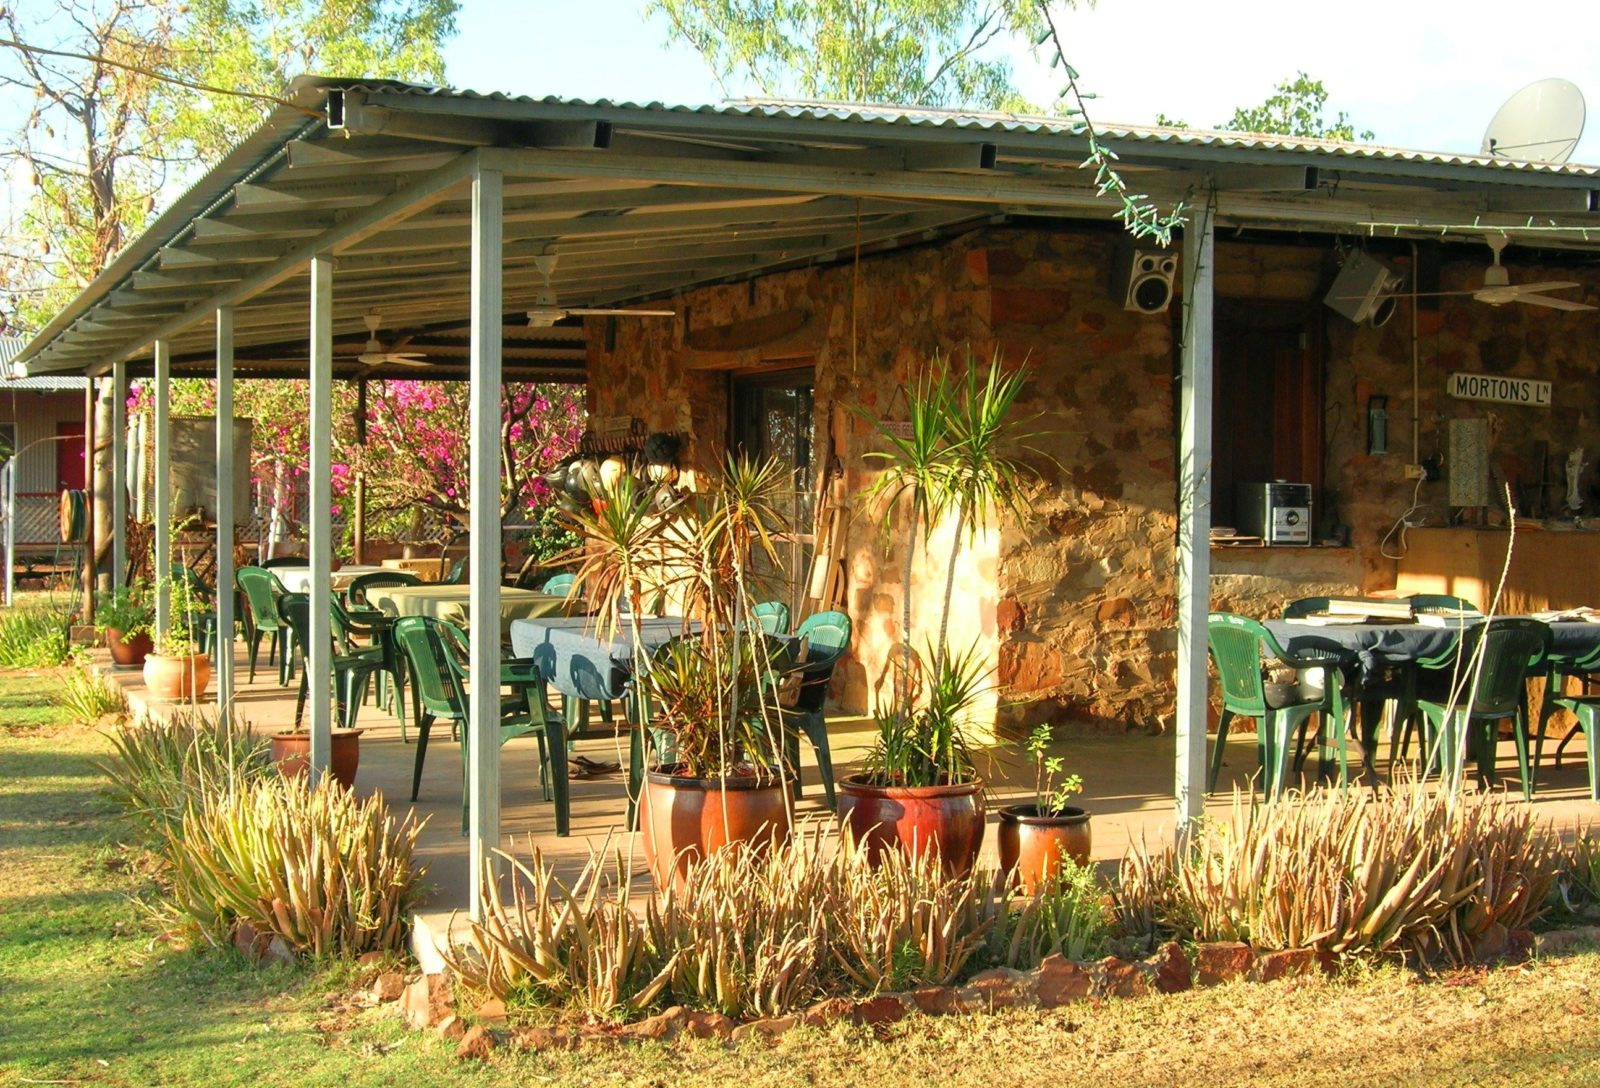 Diggers Rest Station, Wyndham, Western Australia